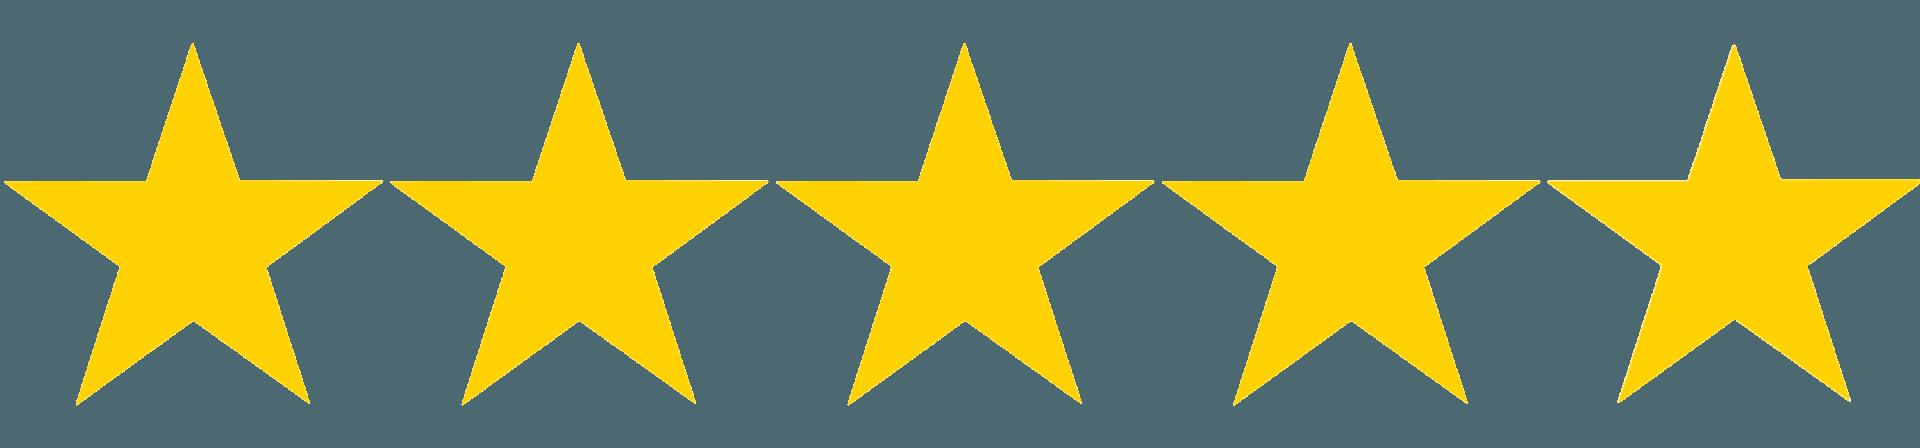 Workers' Compensation - Lonestar 24 HR ER | New Braunfels, Canyon